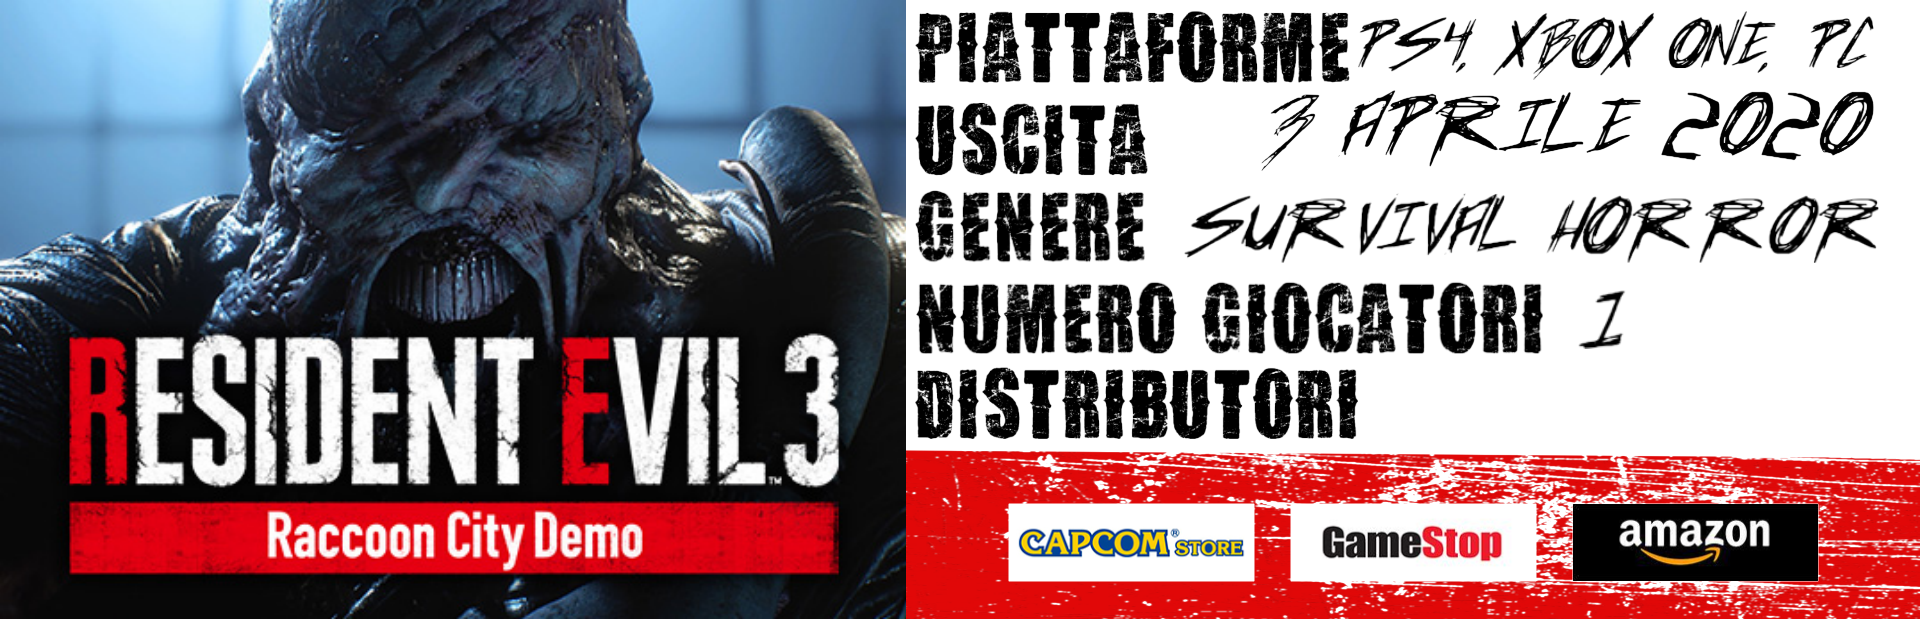 Resident Evil 3 Racoon City